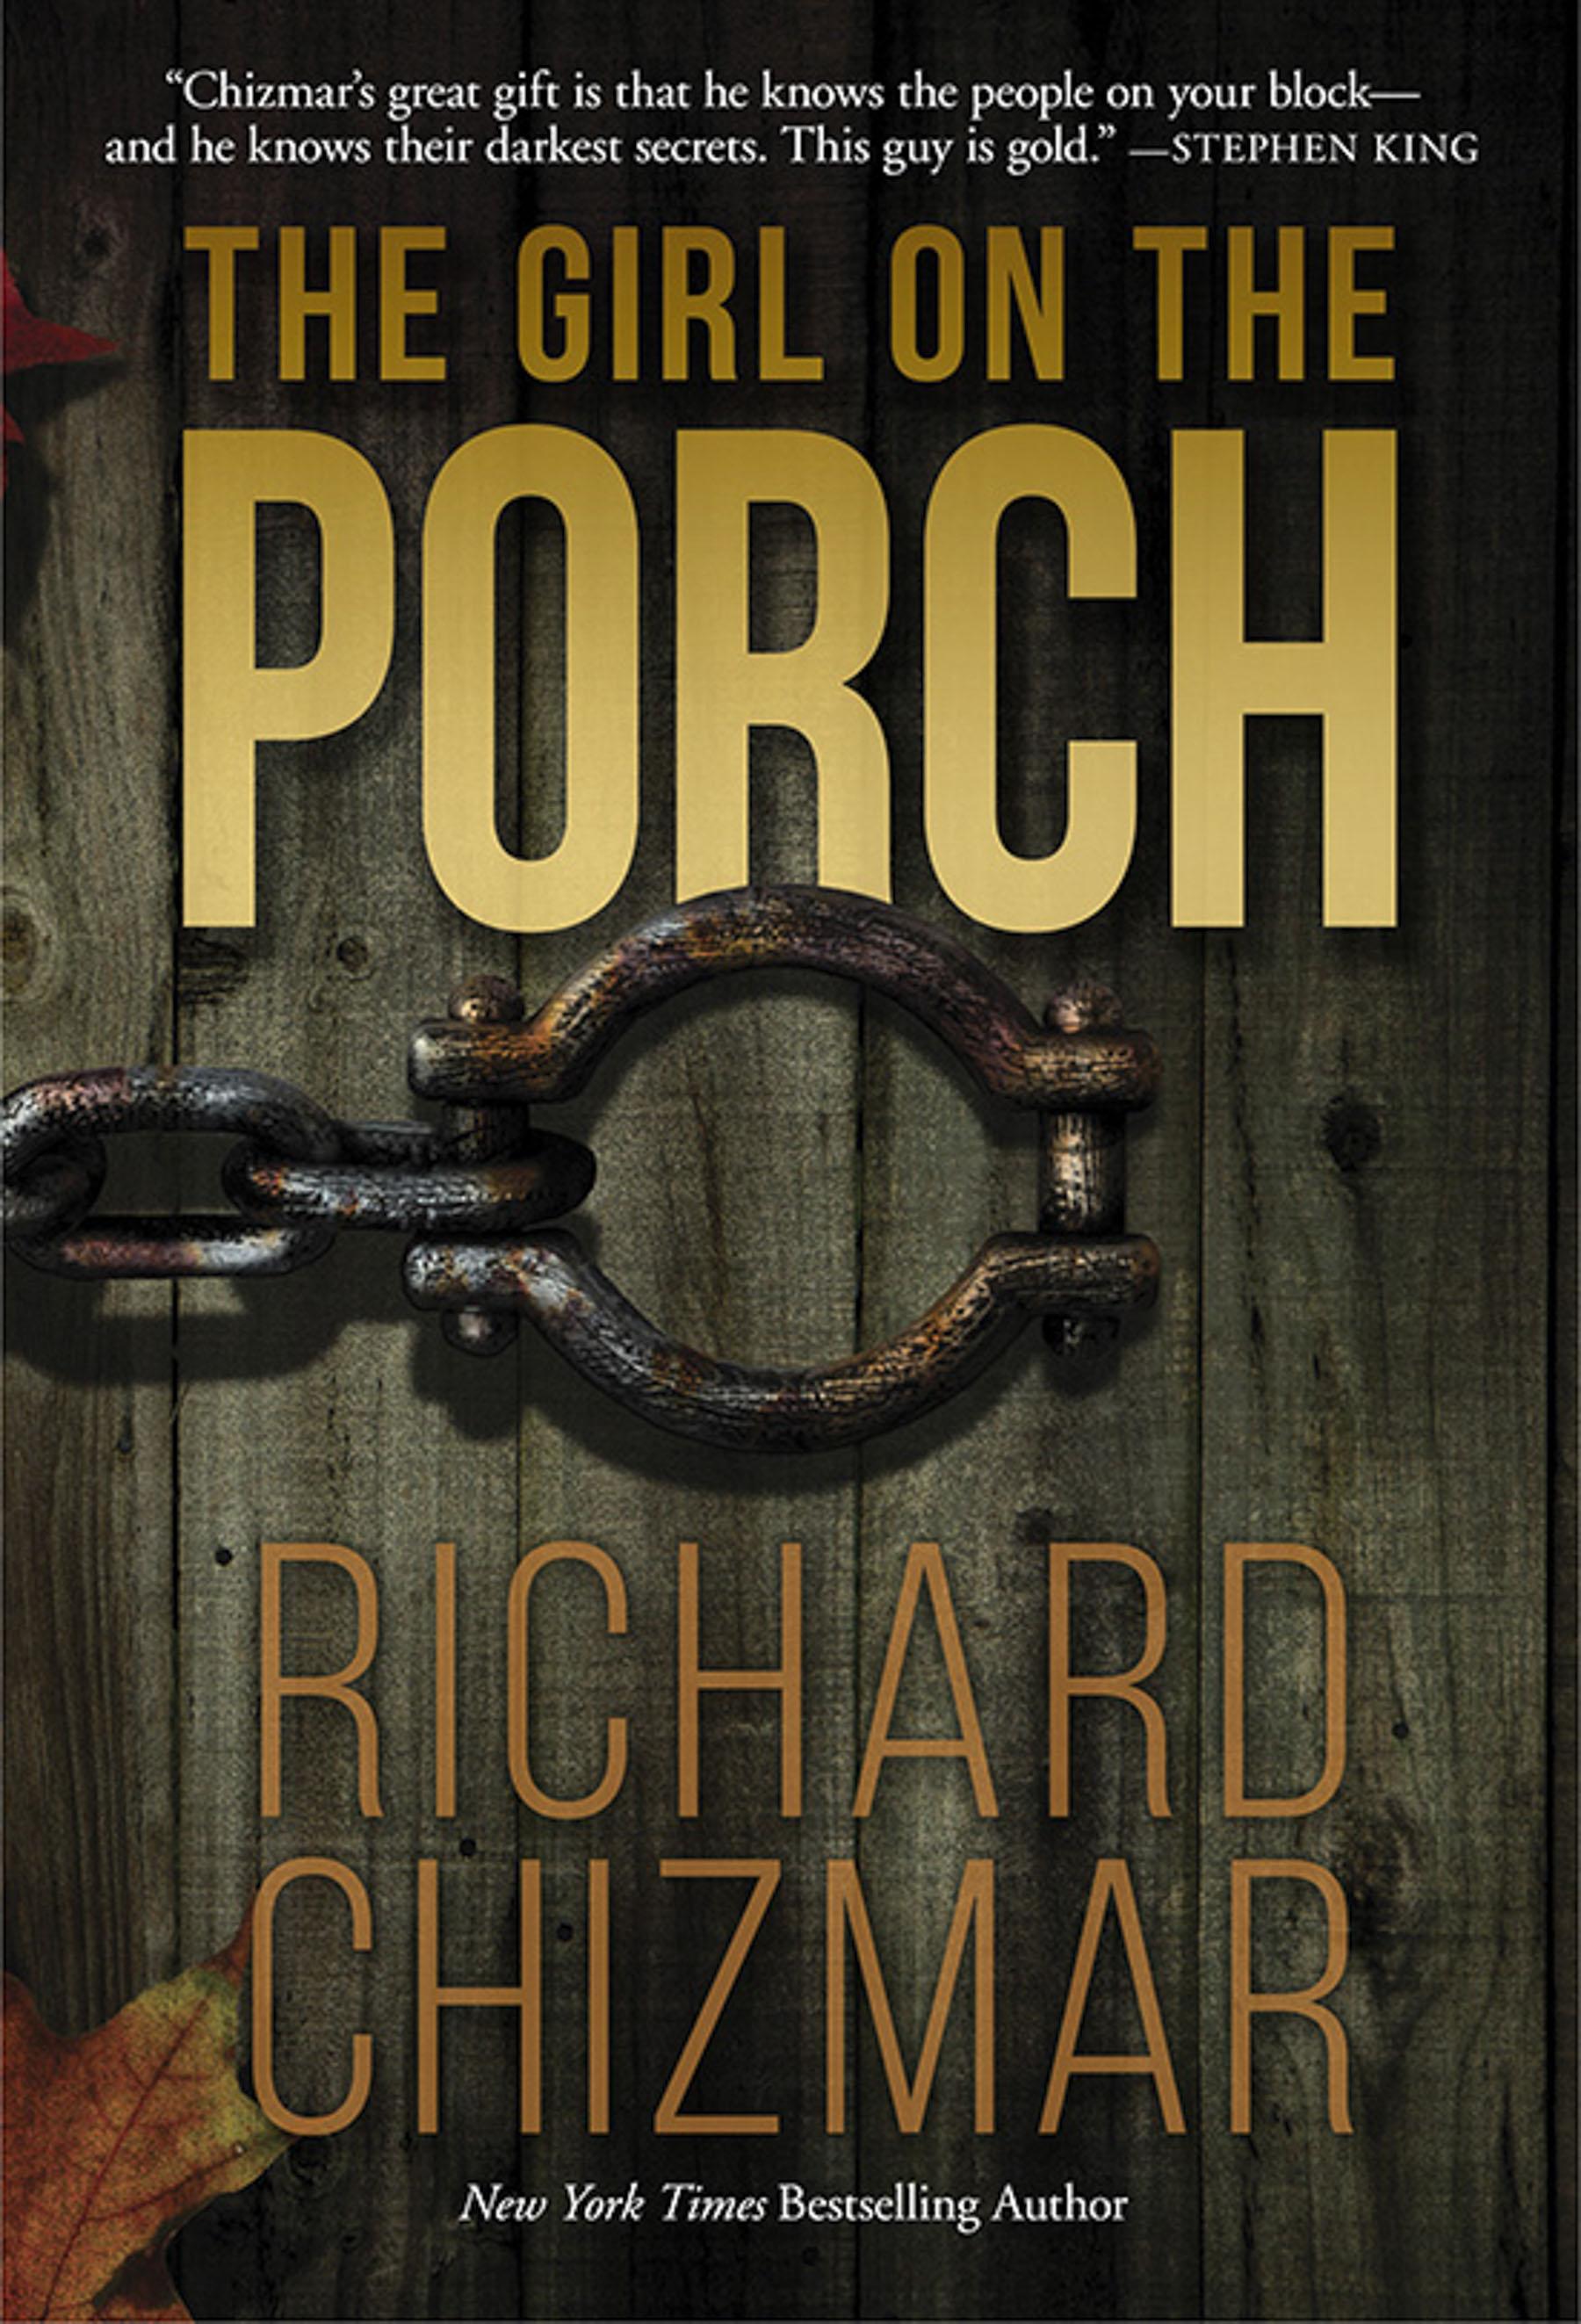 The Girl on the Porch_Richard Chizmar.jpg